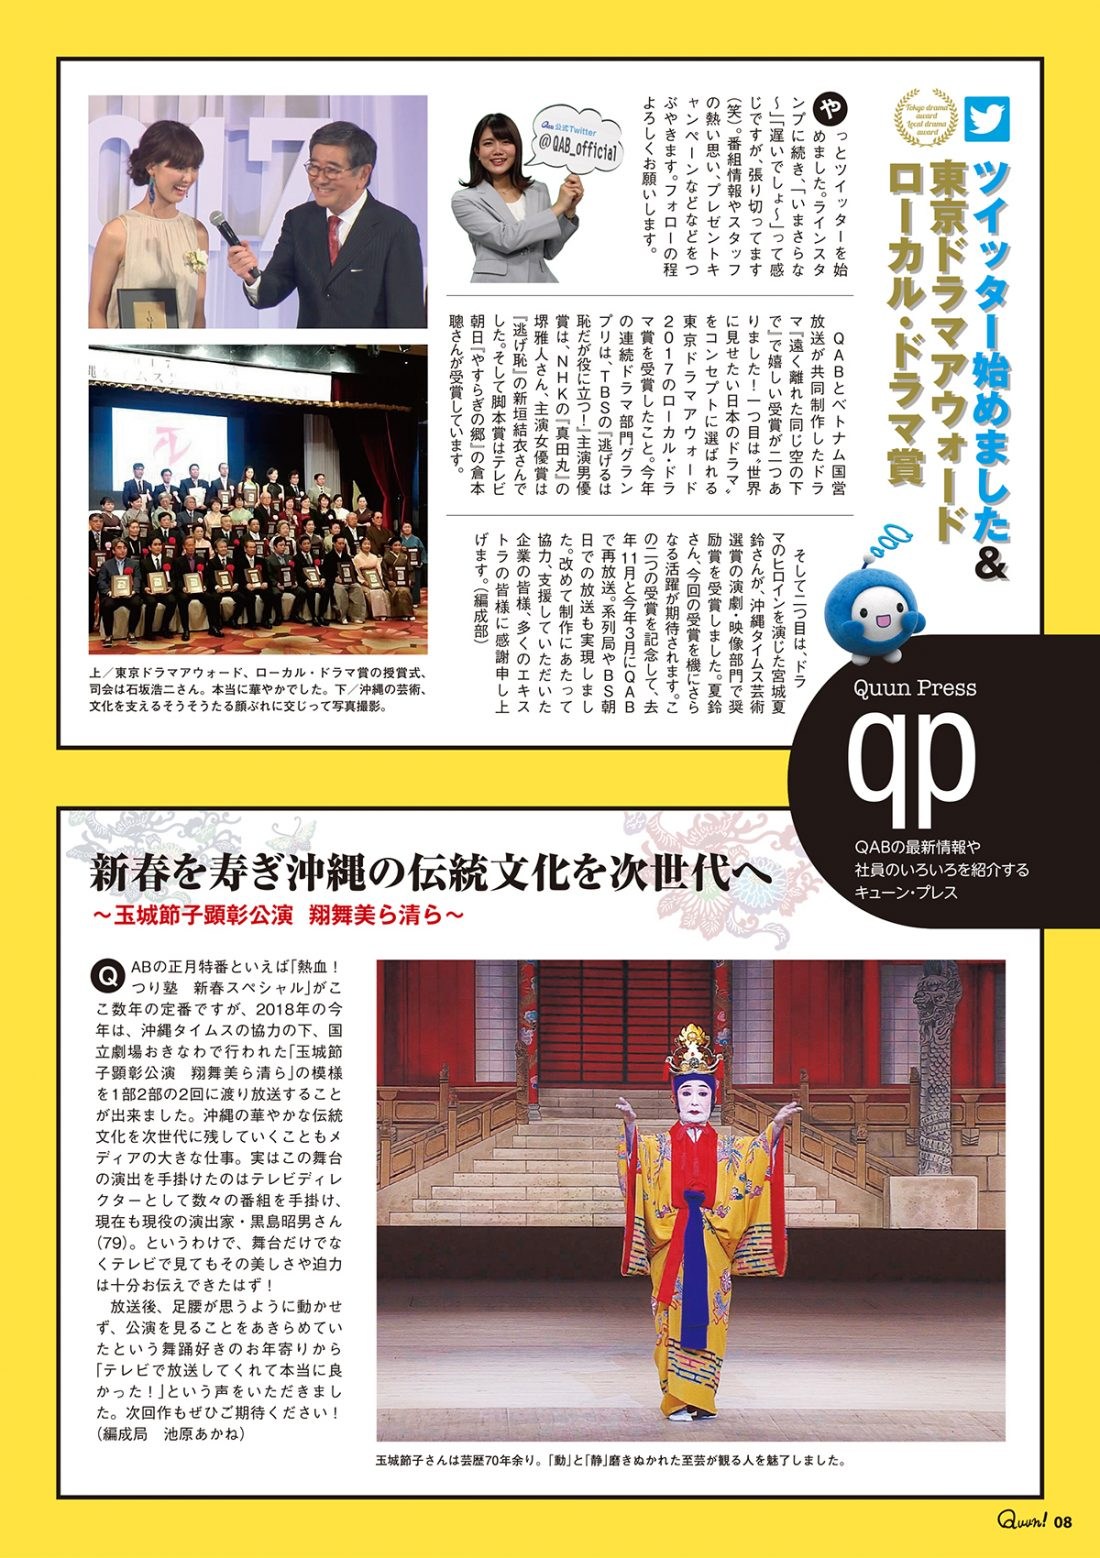 https://www.qab.co.jp/qgoro/wp-content/uploads/quun_0910-1100x1558.jpg